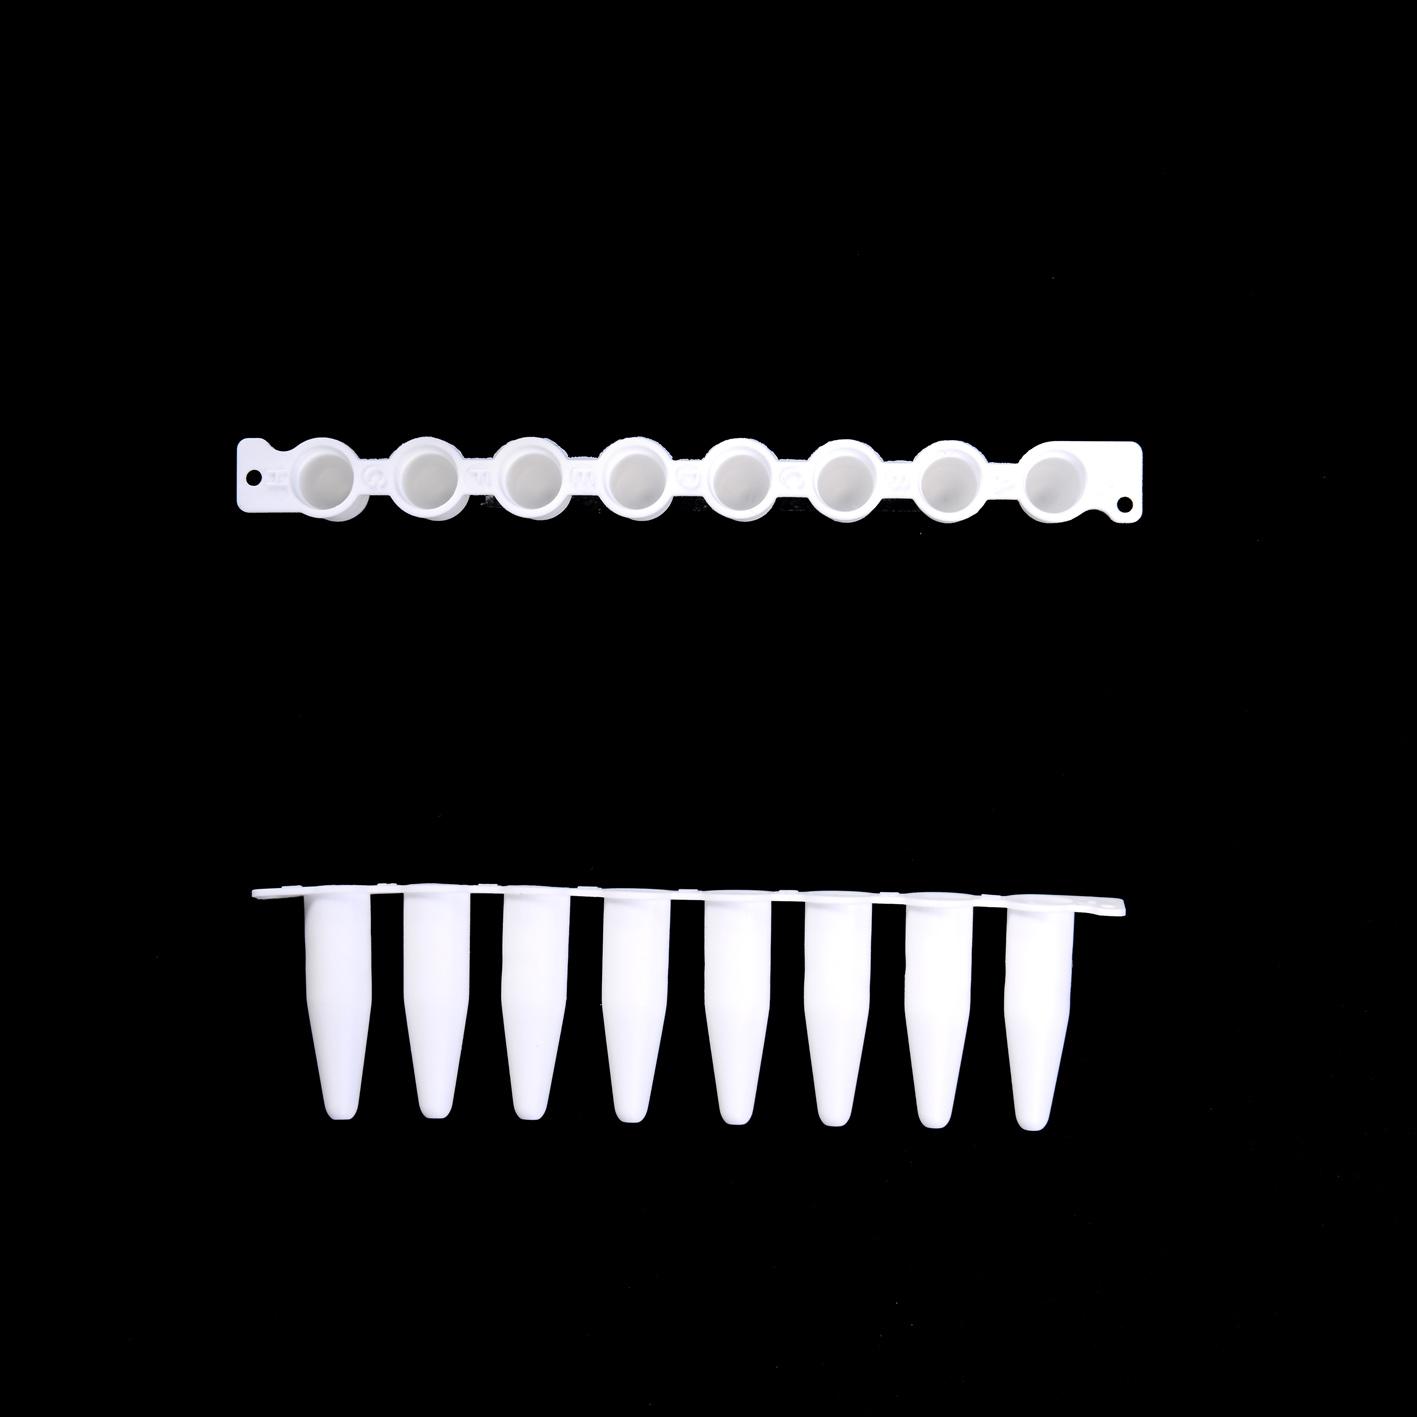 EU 0.2 ml 薄壁八联管(白色,普通连接)